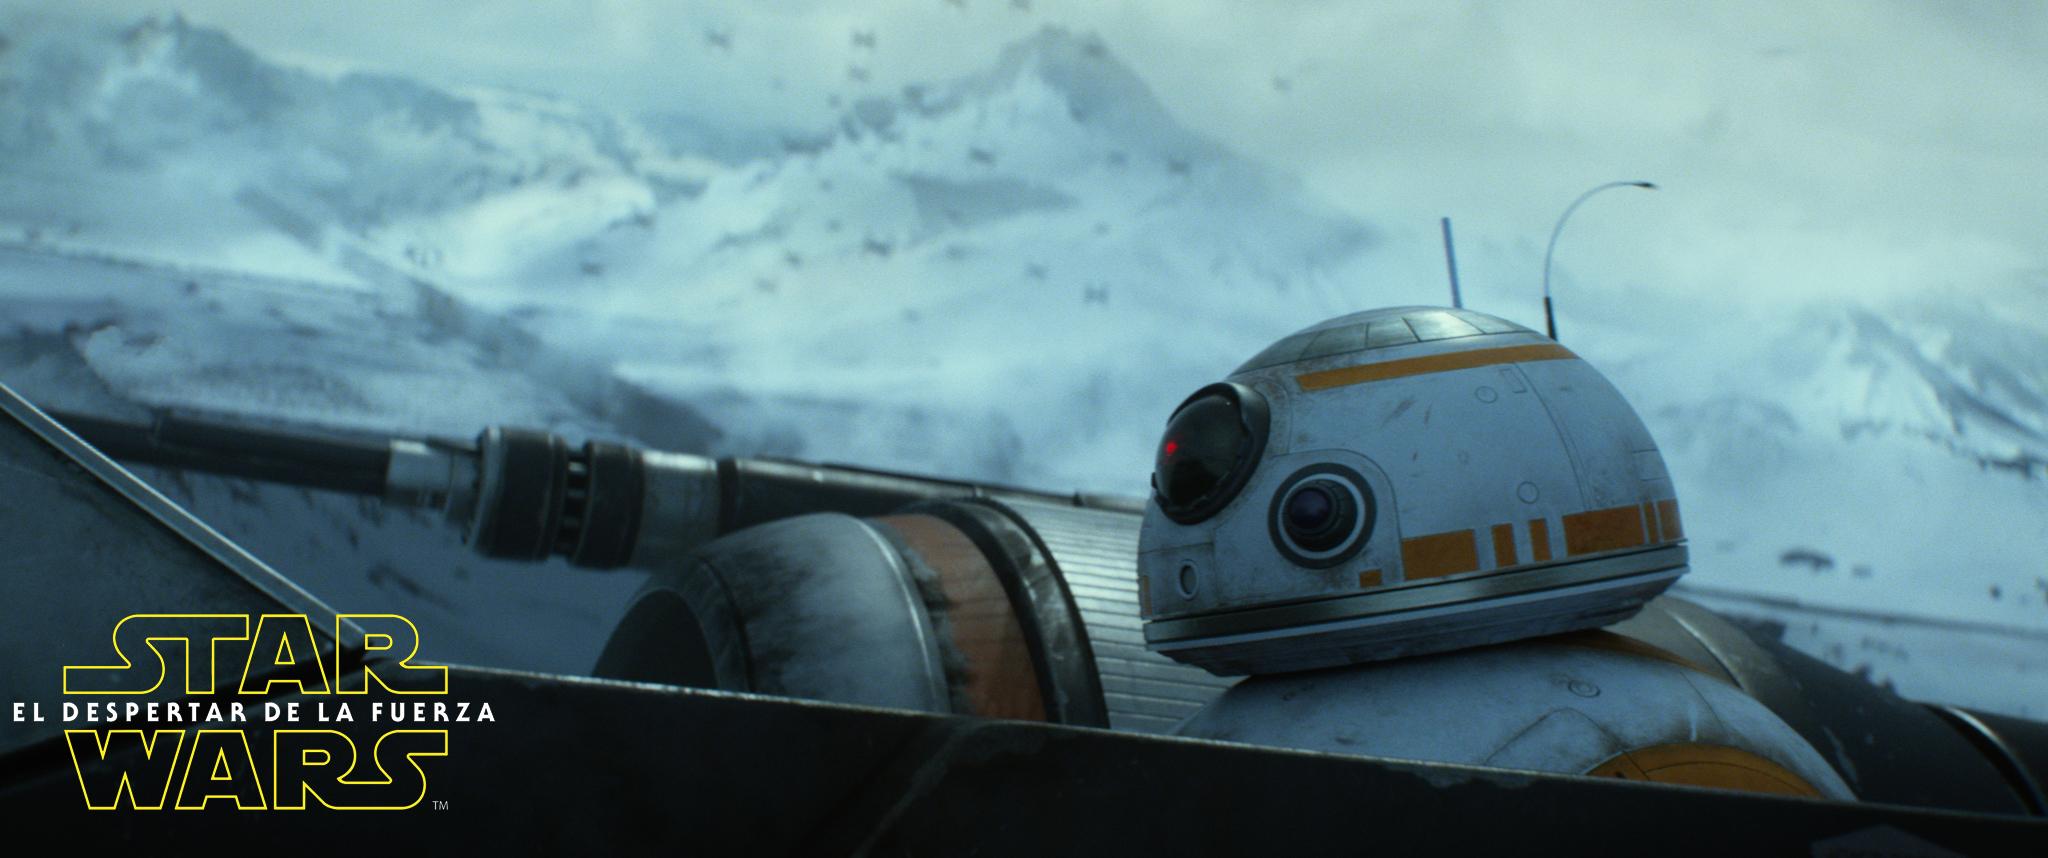 Star Wars The Force Awakens wallpaper 6